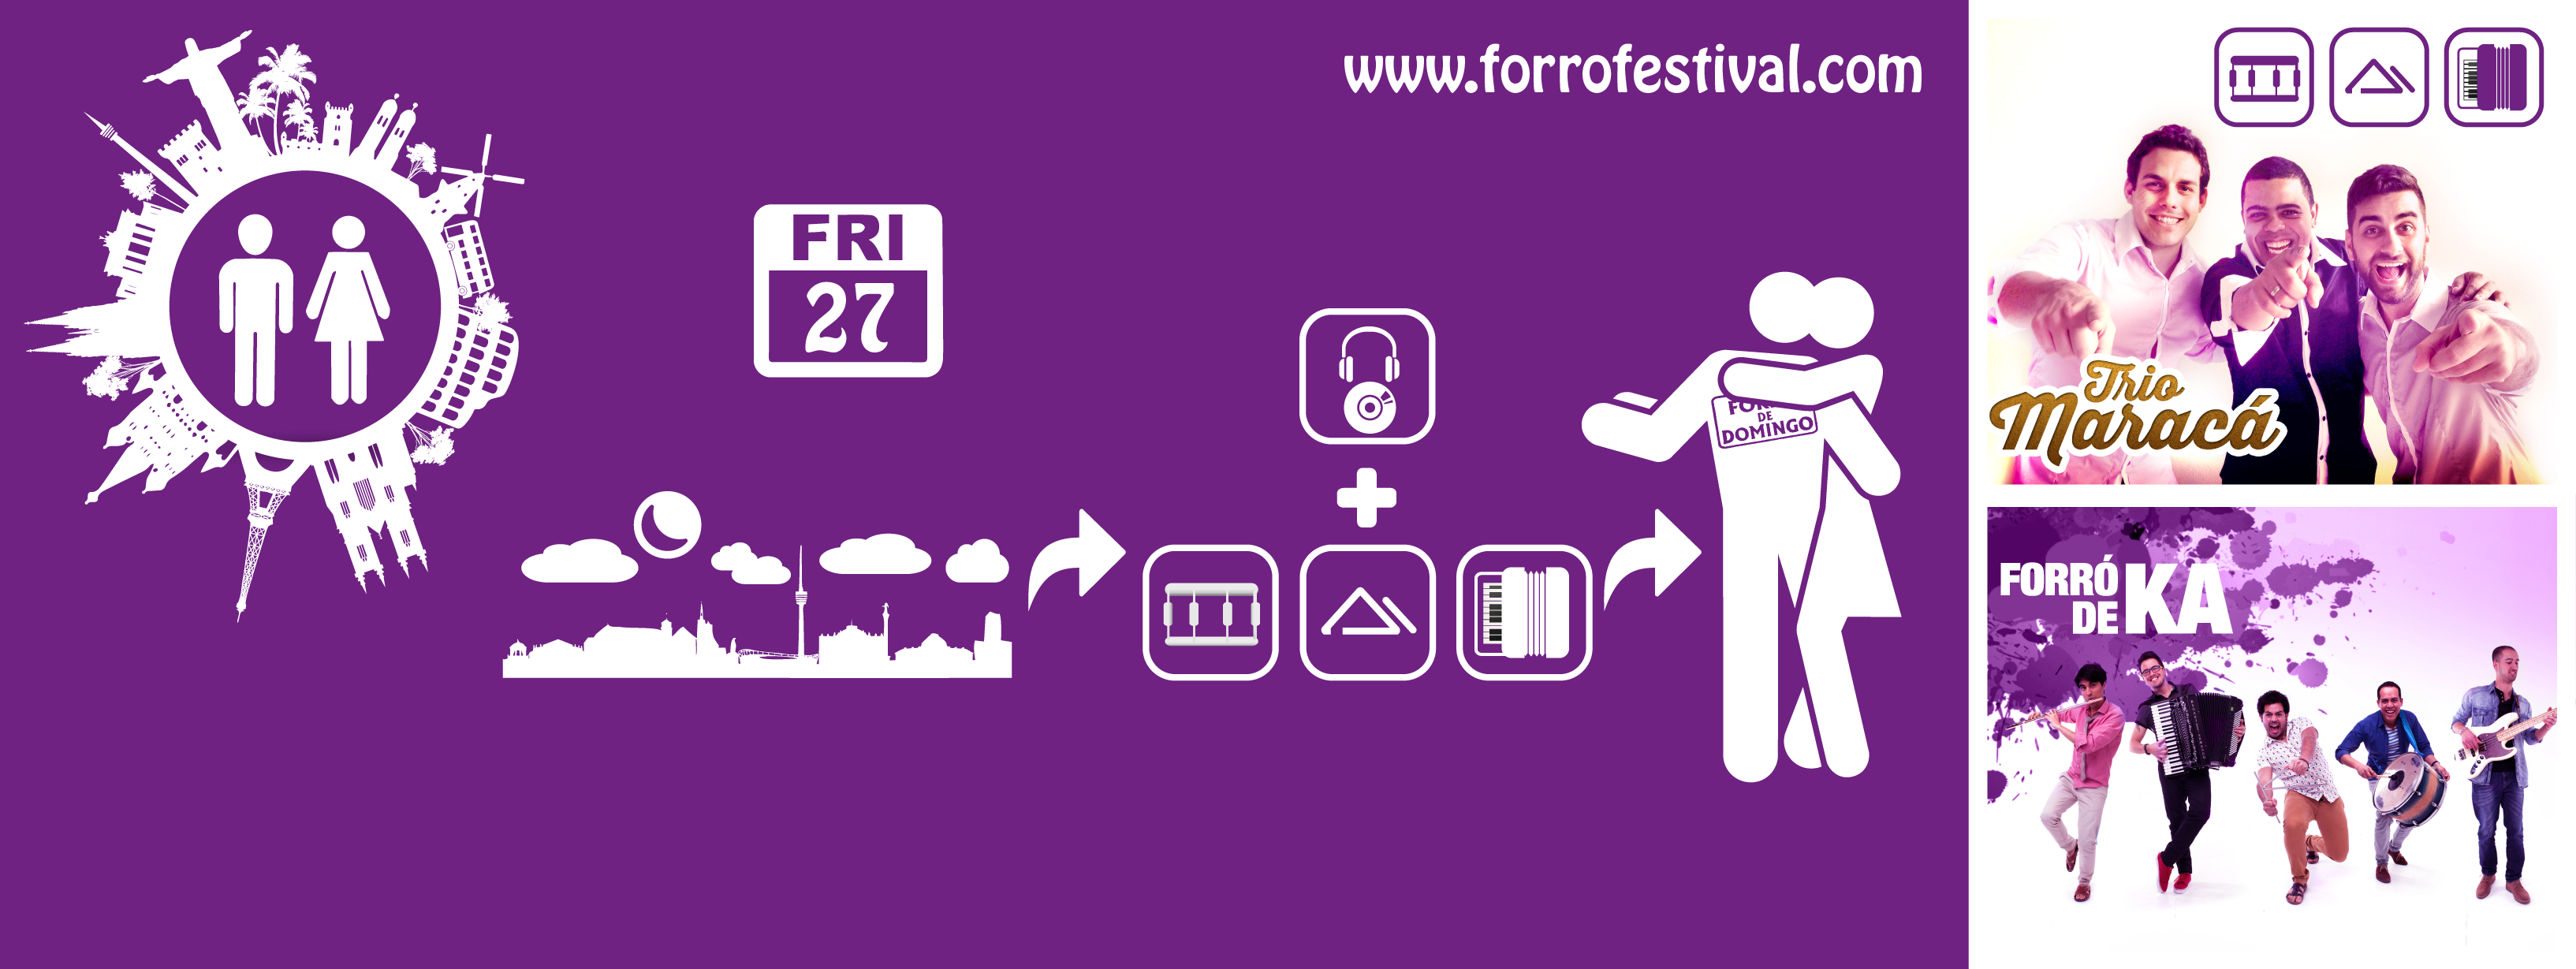 http://forrofestival.com/wp-content/uploads/2014/06/BANNER-FB-FESTIVAL-PICTOGRAM-2016_FRIDAY.png